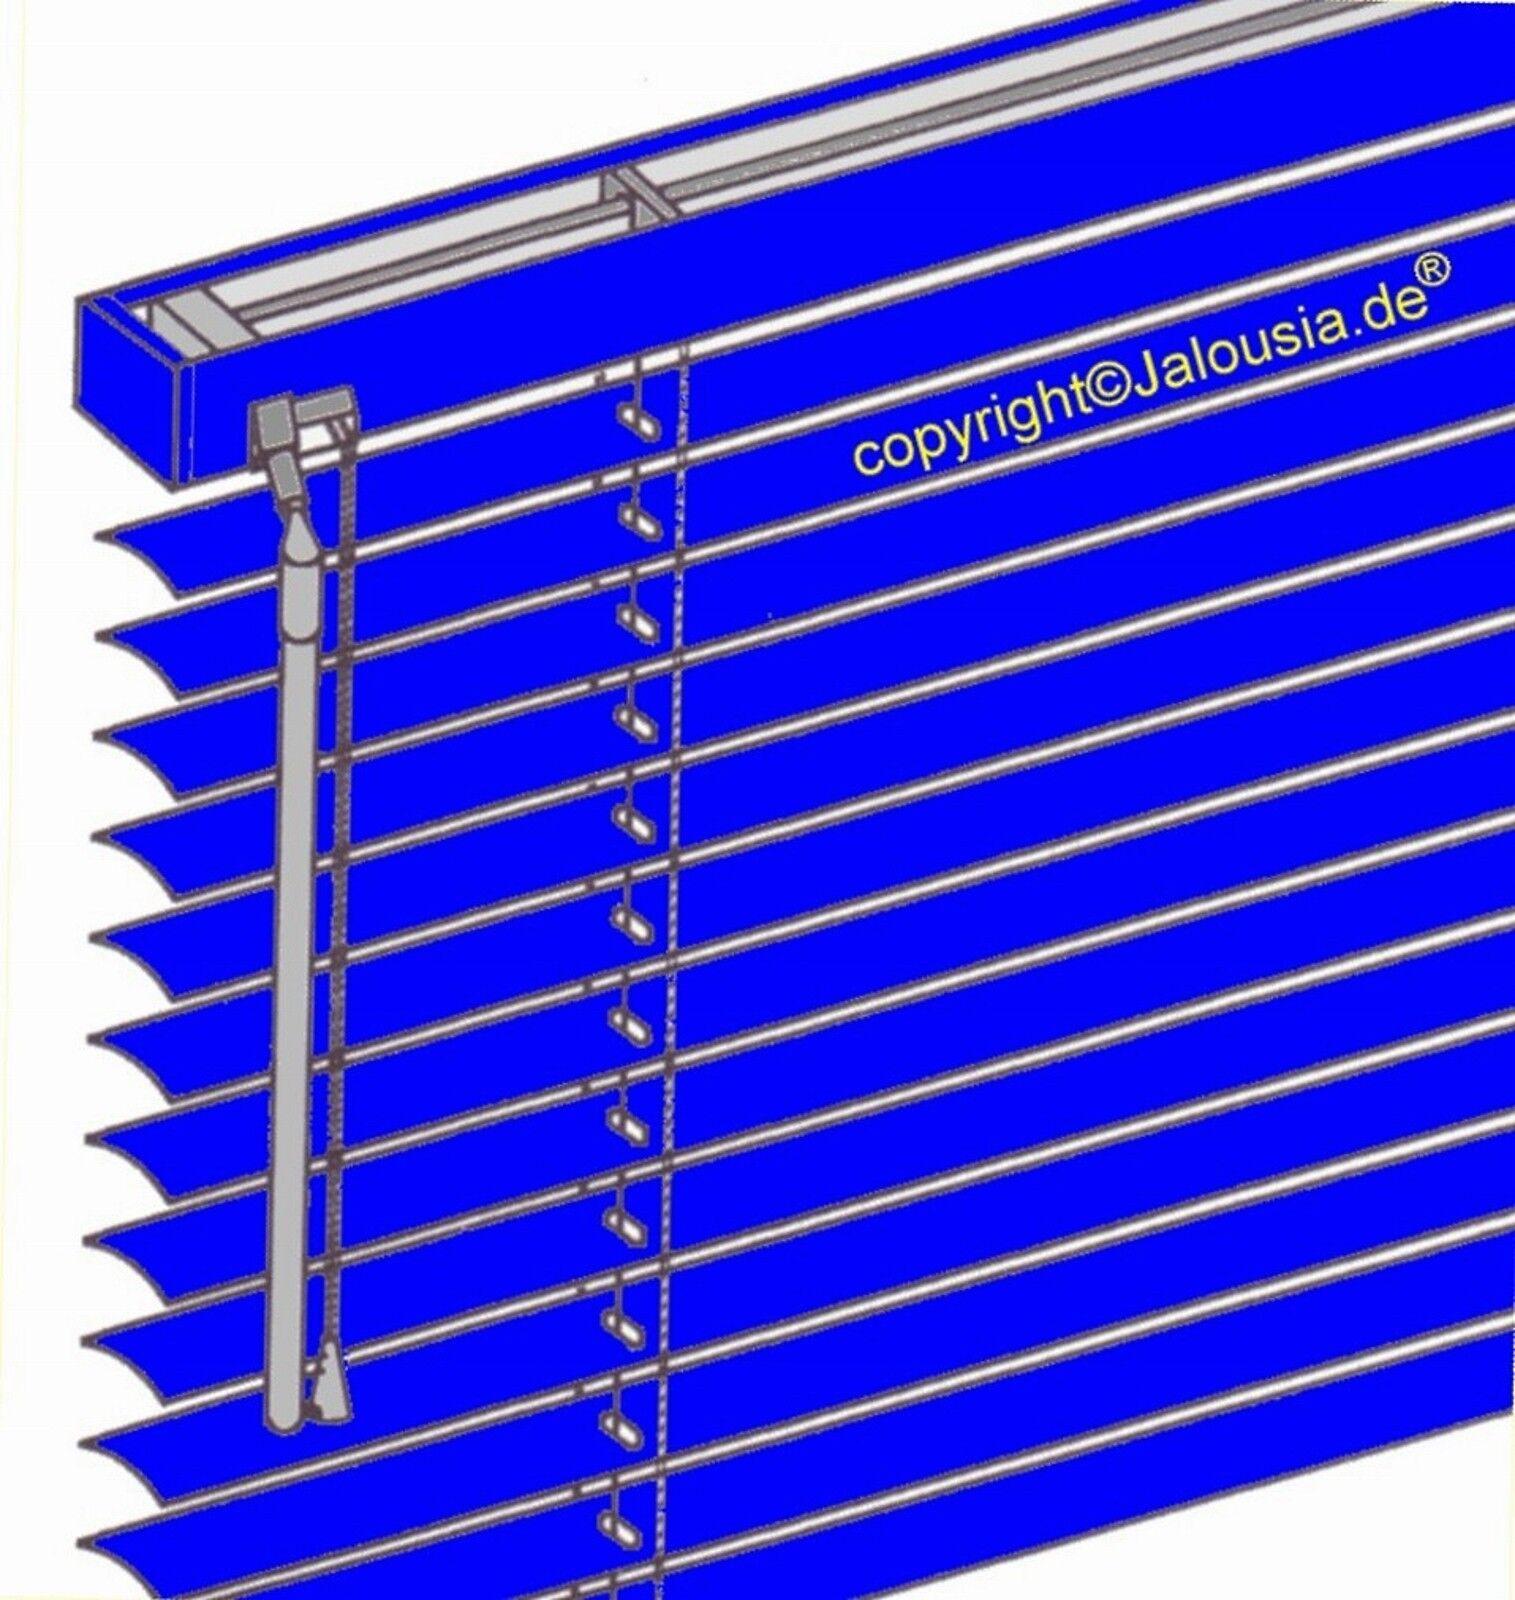 JALOUSIE KJH KJH KJH Bambus 35 mm Bambusjalousie Bambusrollo Holzjalousie Holzrollo Maß | Einzigartig  4a3c7d